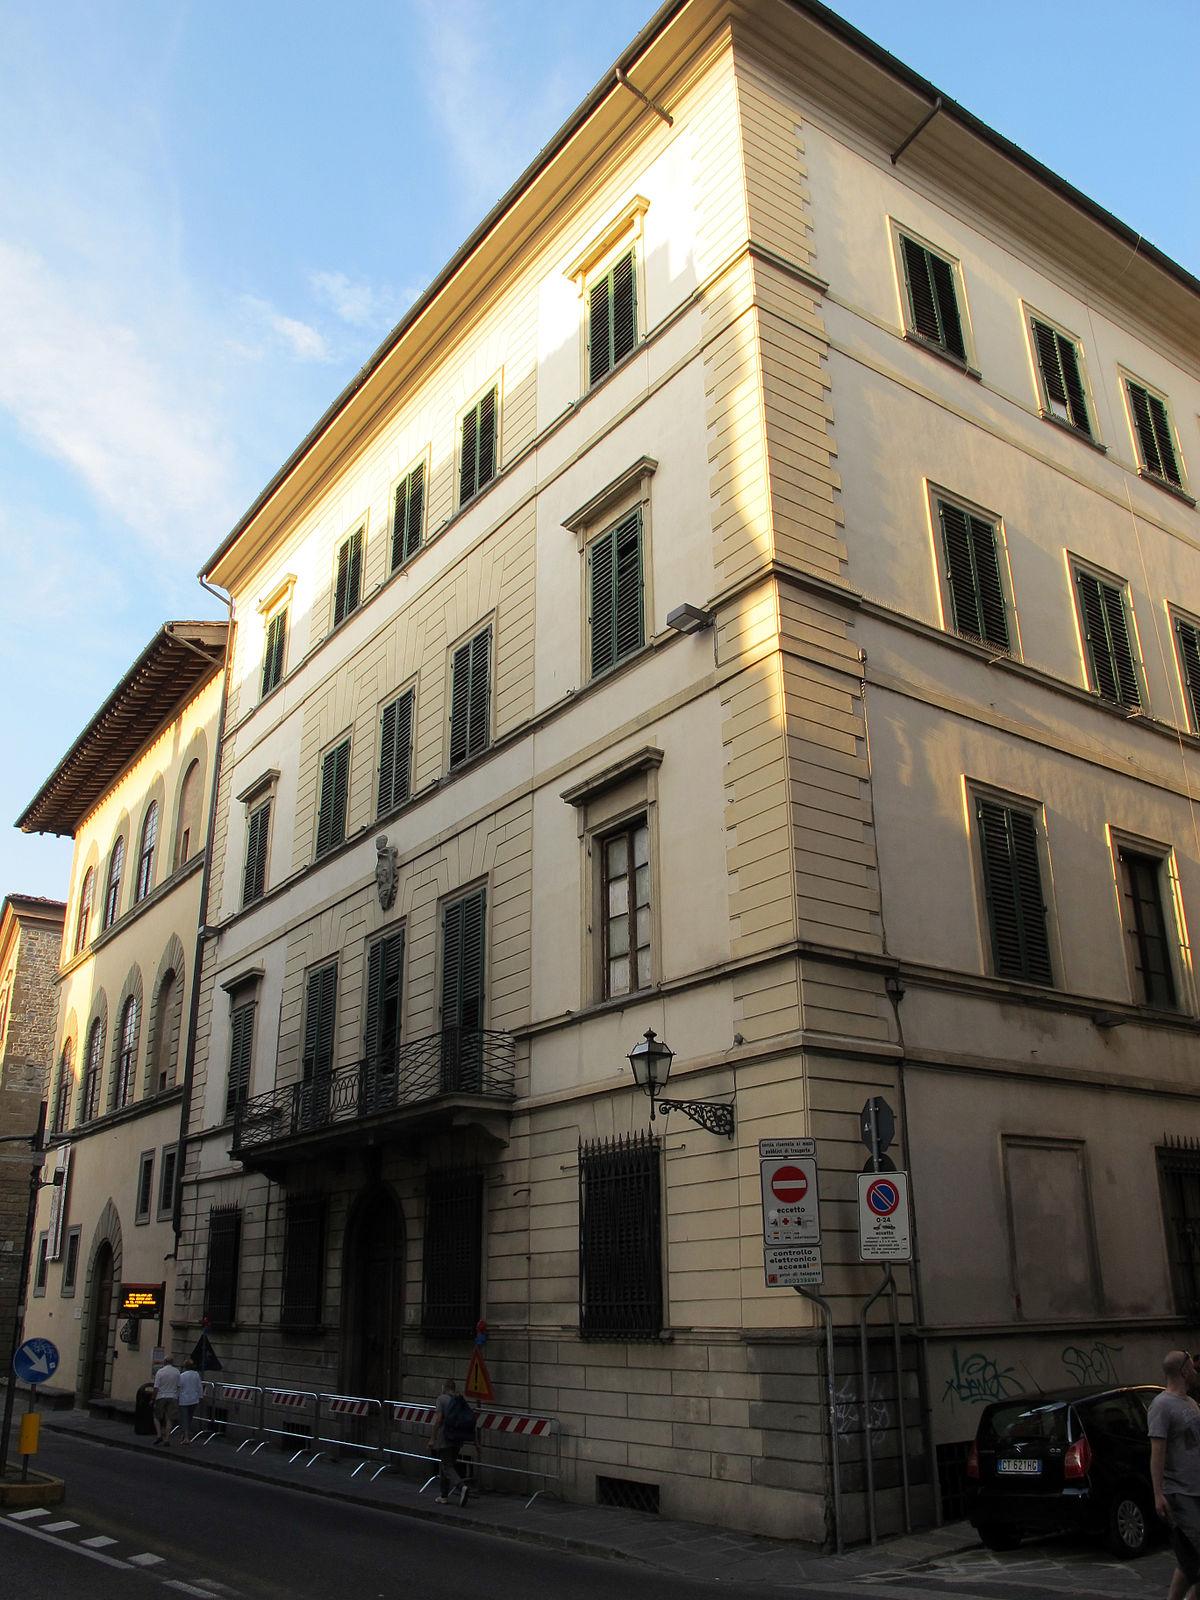 Palazzo fossi wikipedia for Palazzo a 4 piani